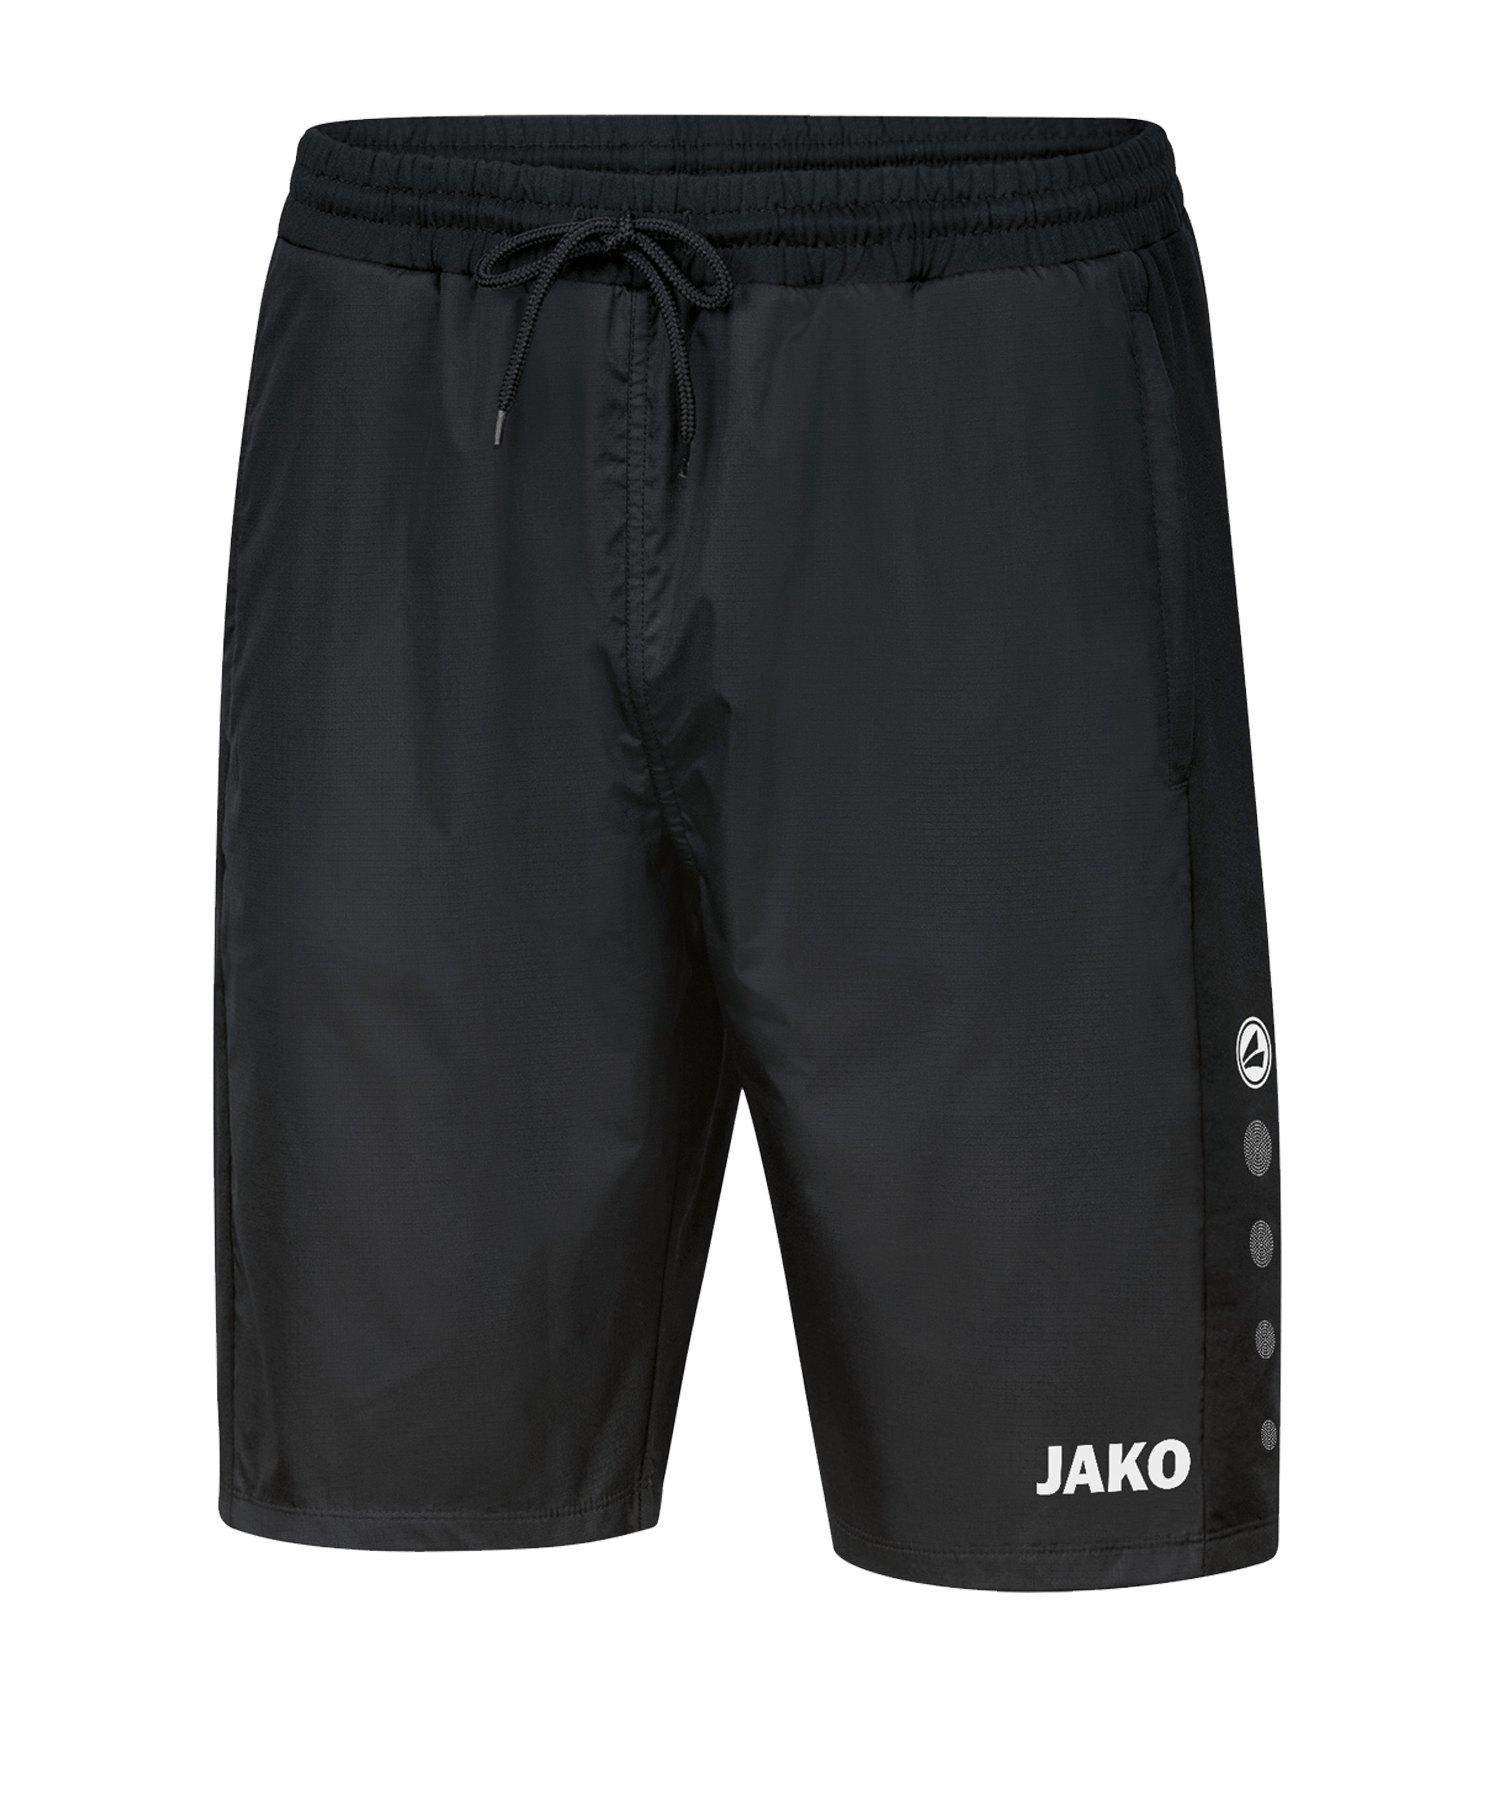 JAKO Trainingsshort Winter Schwarz F08 - schwarz